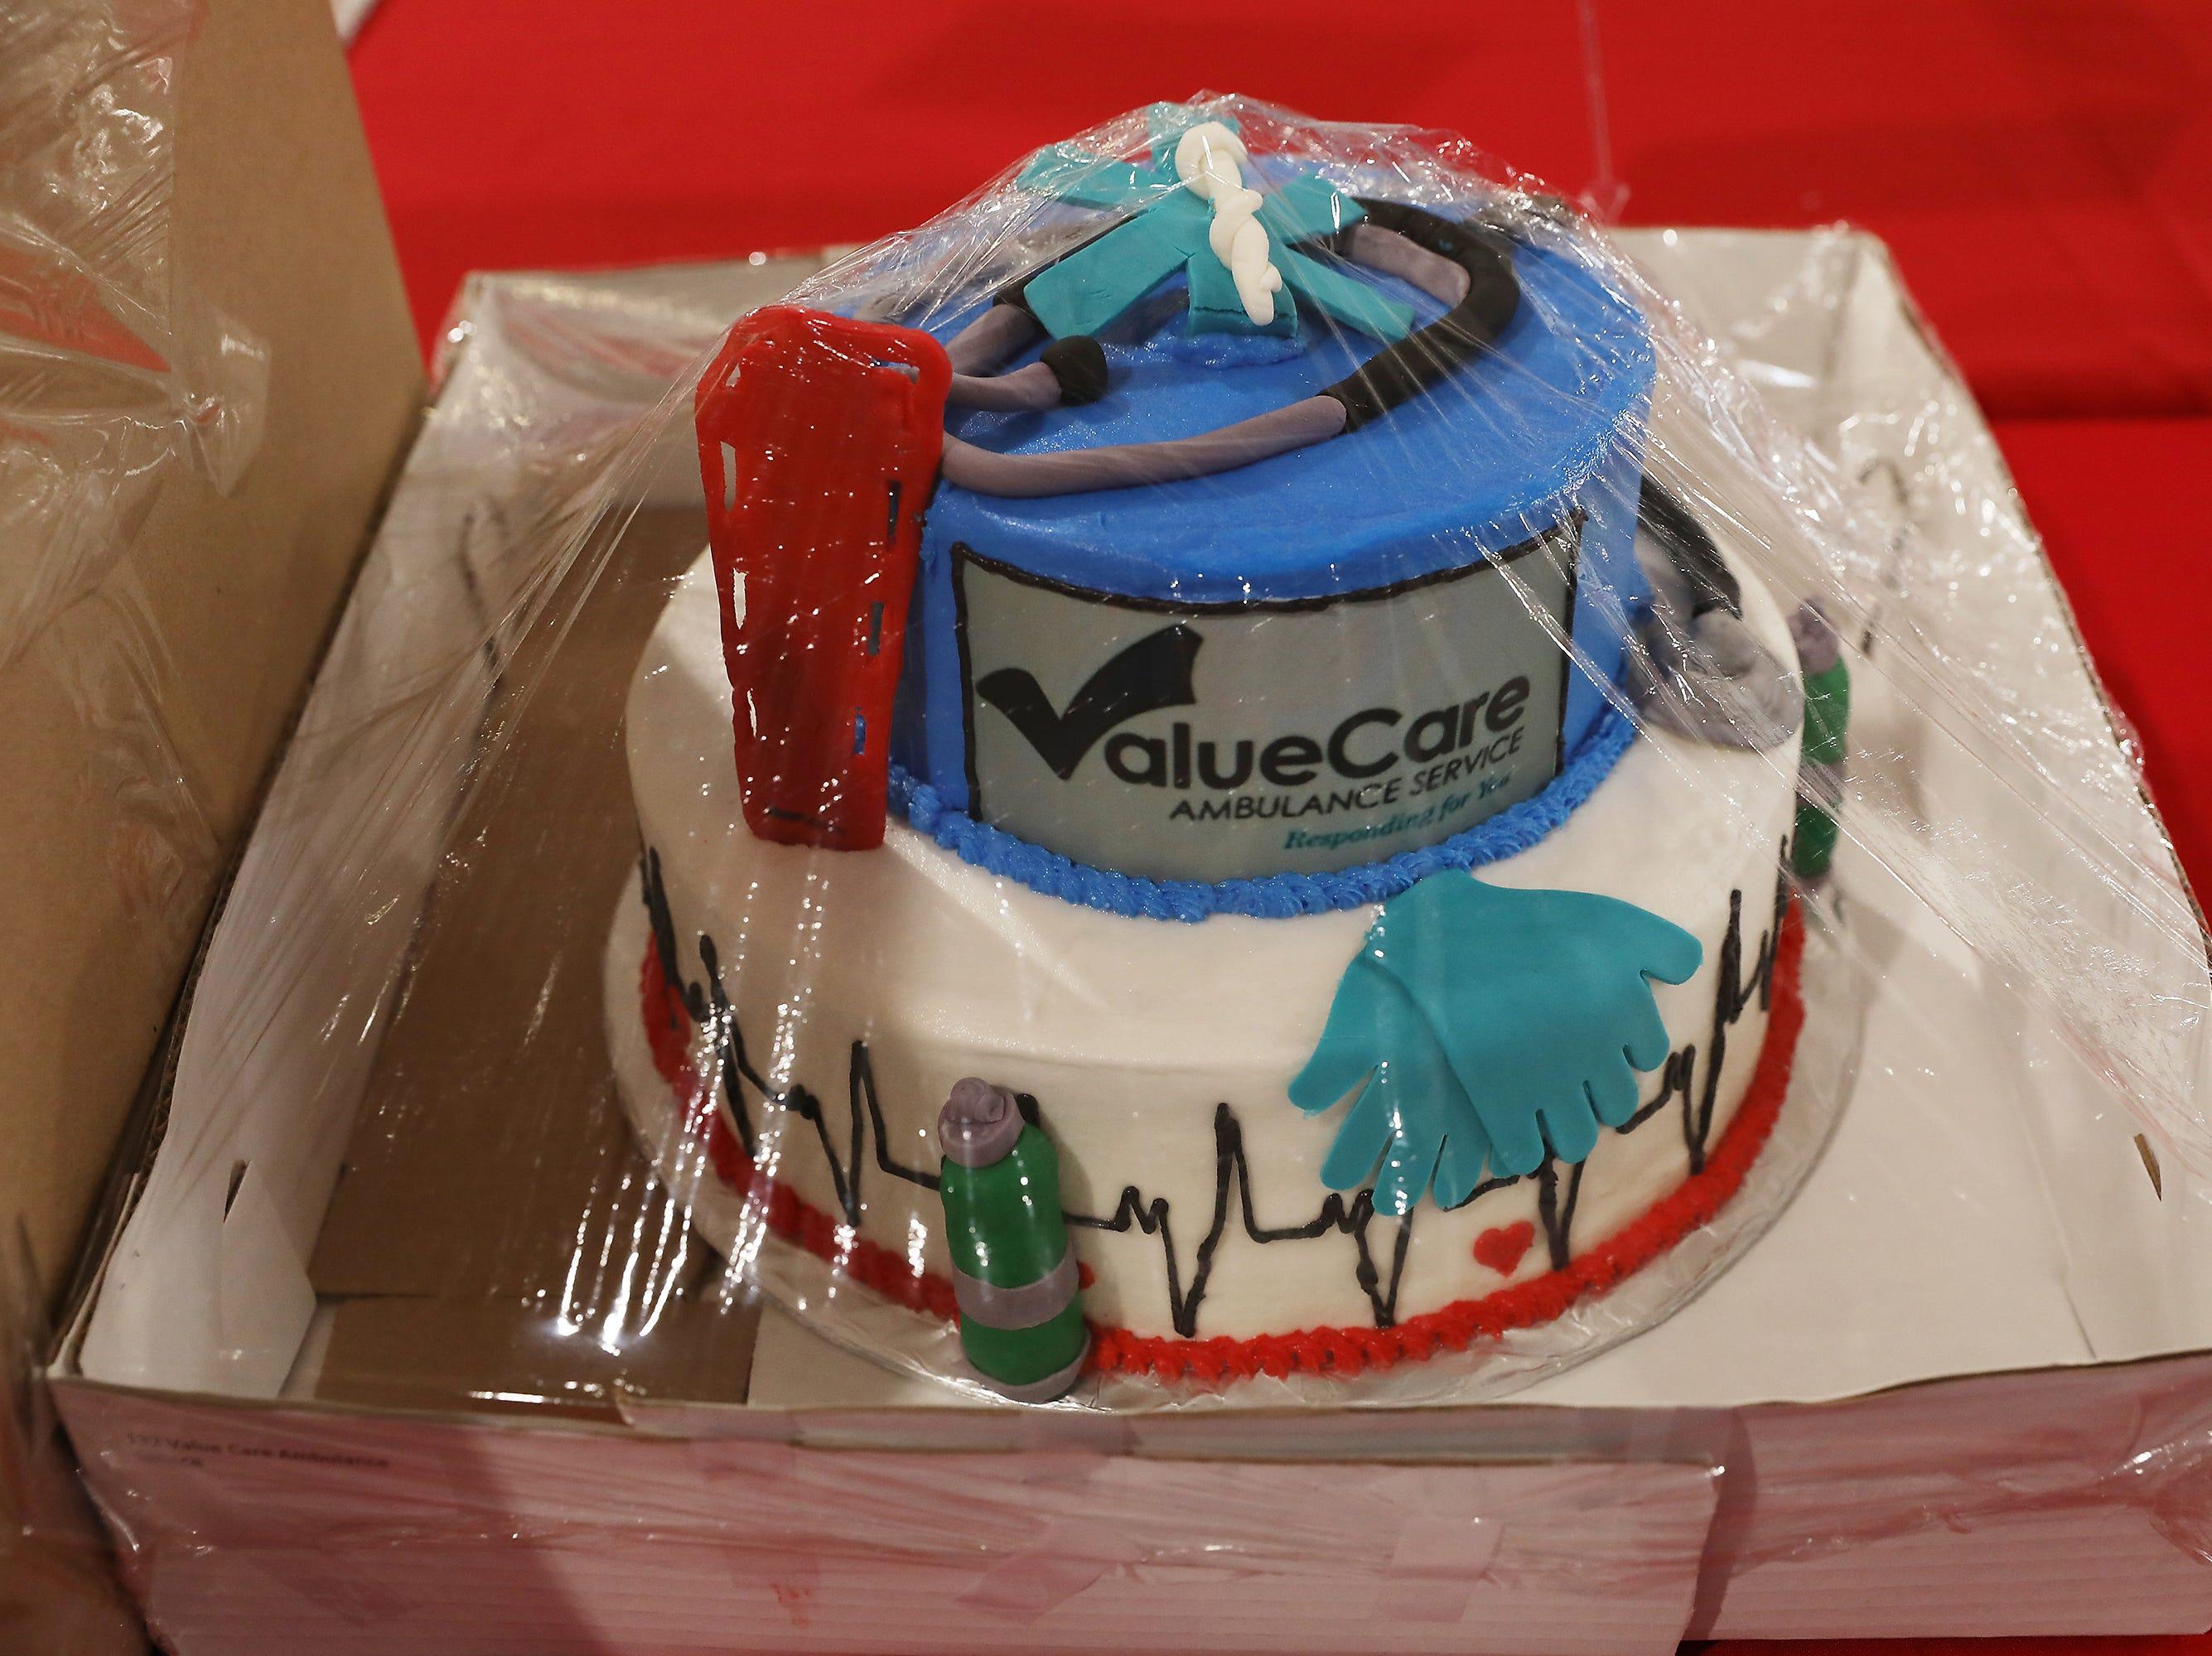 2:30 P.M. Thursday cake 132 Value Care Ambulance Service - $200 Southwest gift card